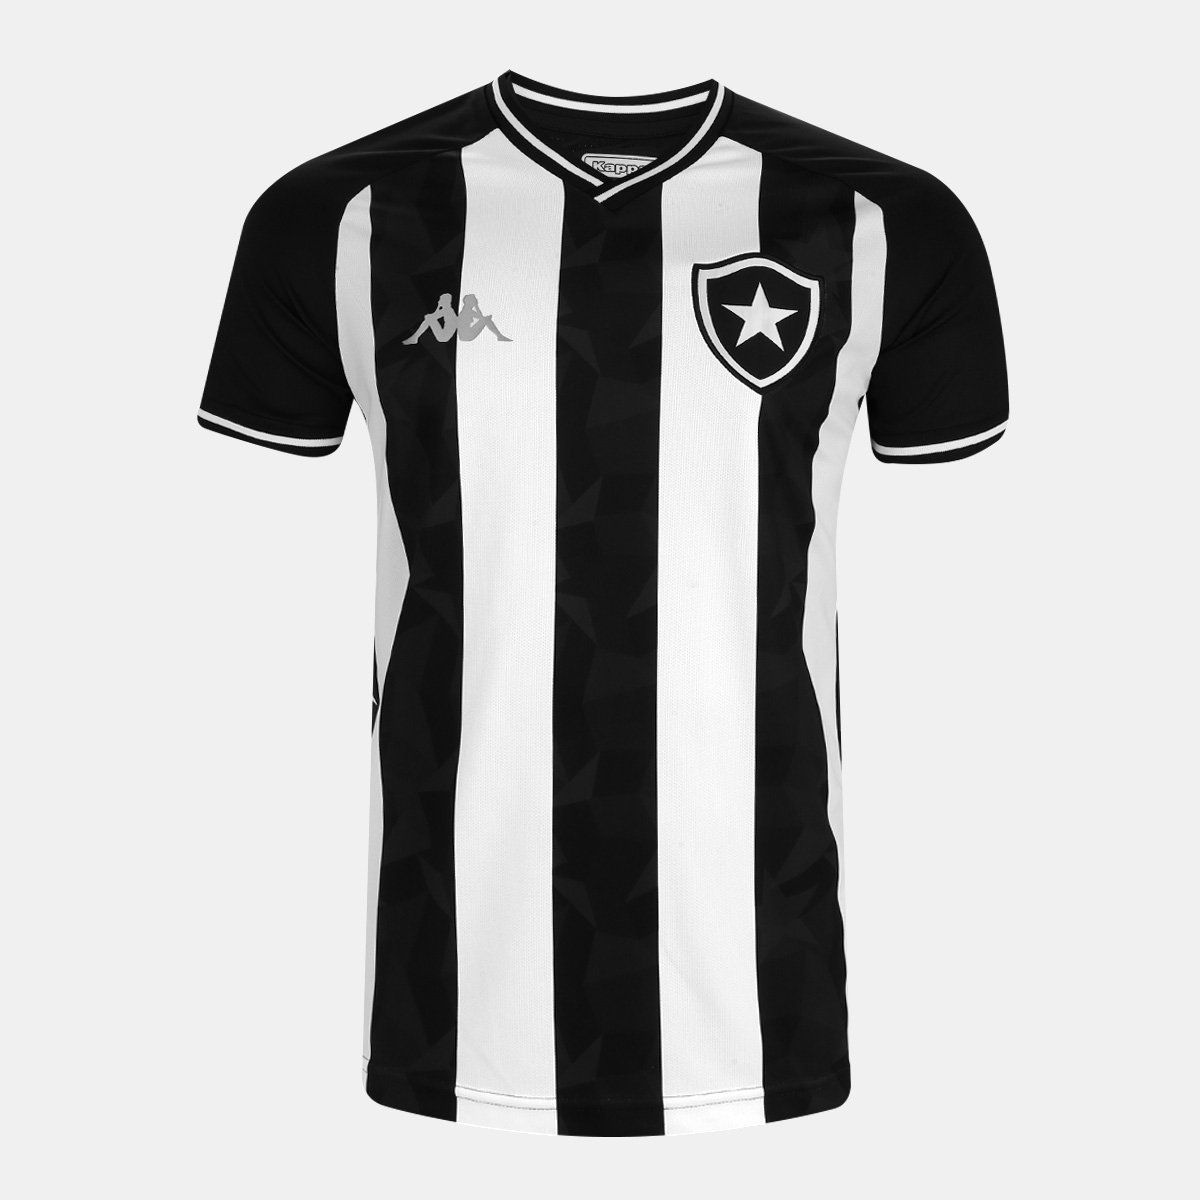 Camisa Kappa Oficial I Kalou 8  Juvenil - PRÉ-VENDA